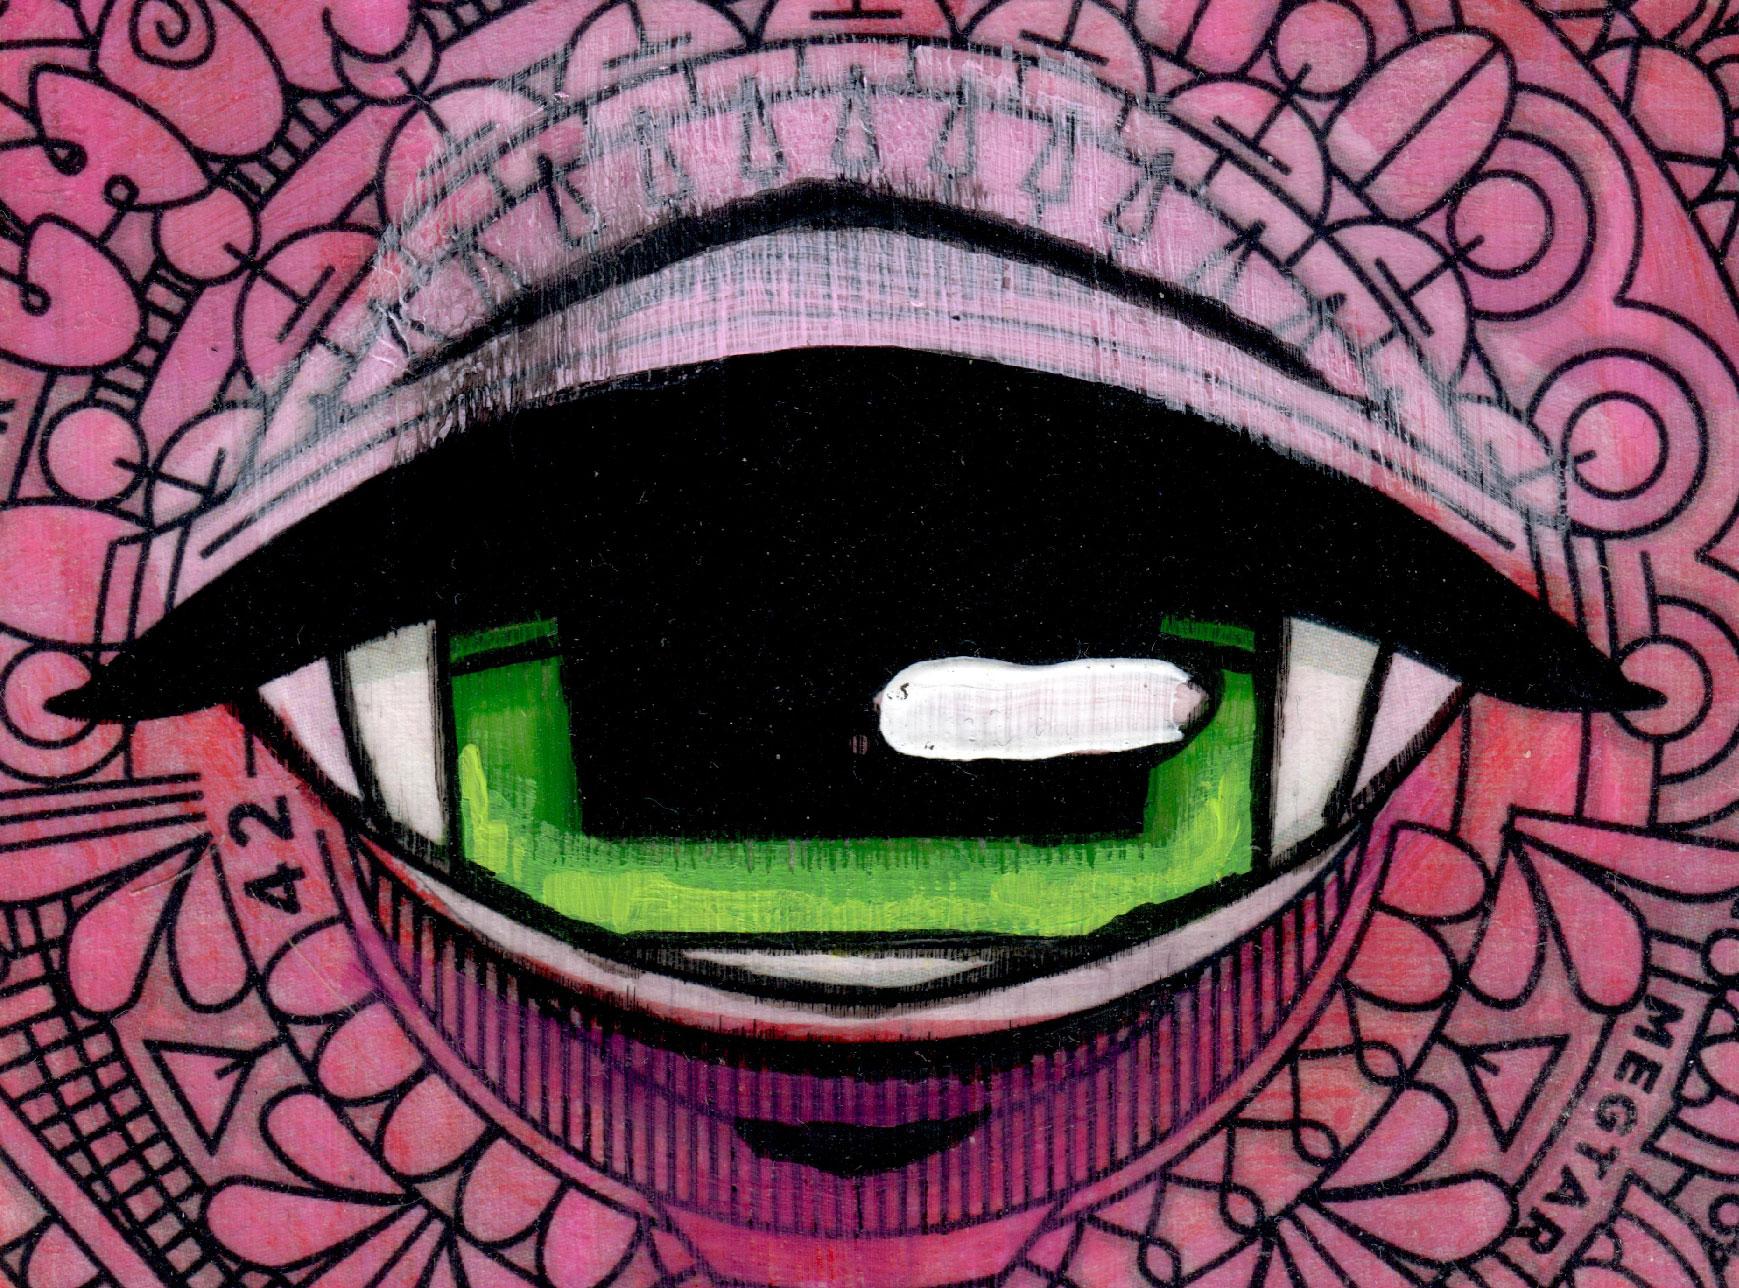 VisumEstBonum#2-Painting_Detail2.jpg